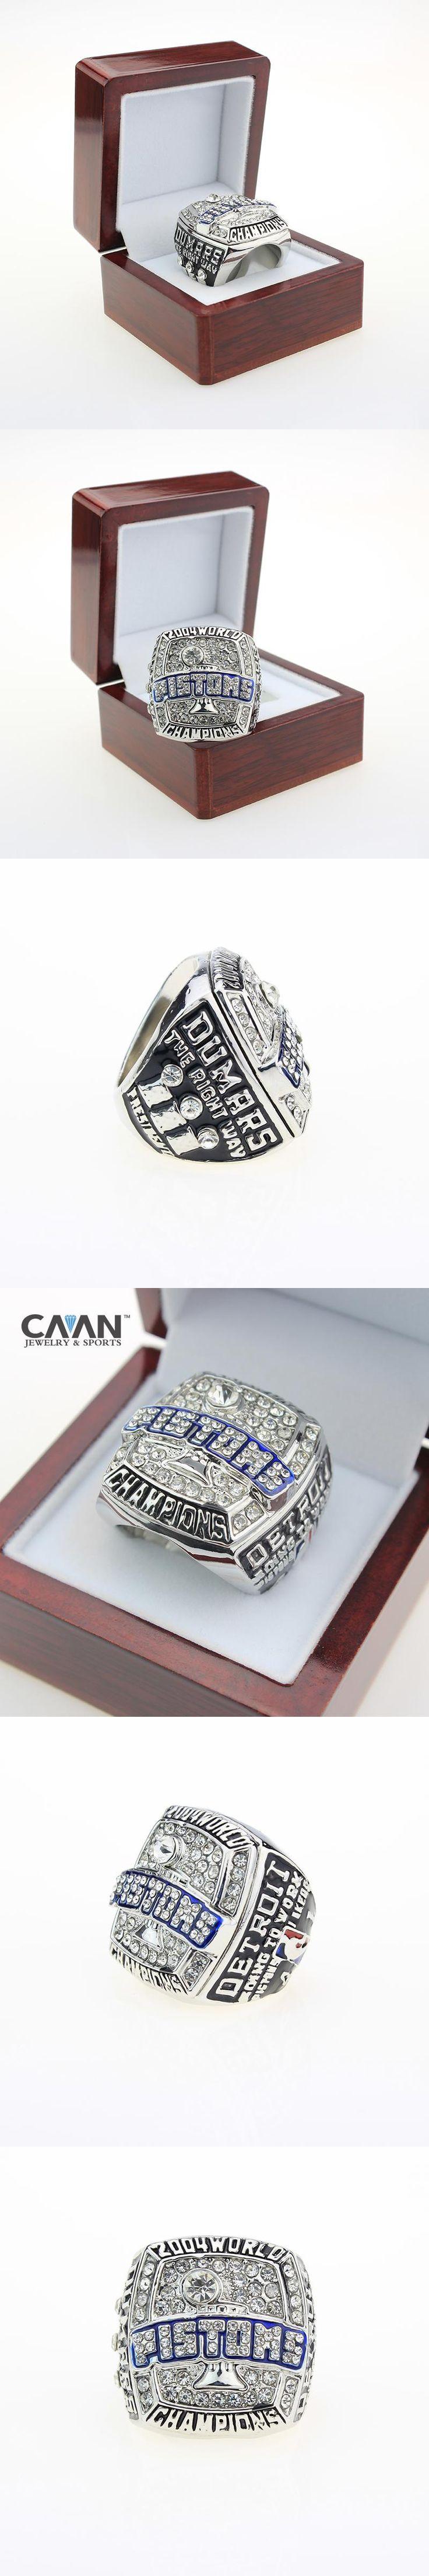 Free shipping Hot selling Sport ring  2004 Detroit Piston Basketball World Championship Ring Replica Size 11 Free shipping